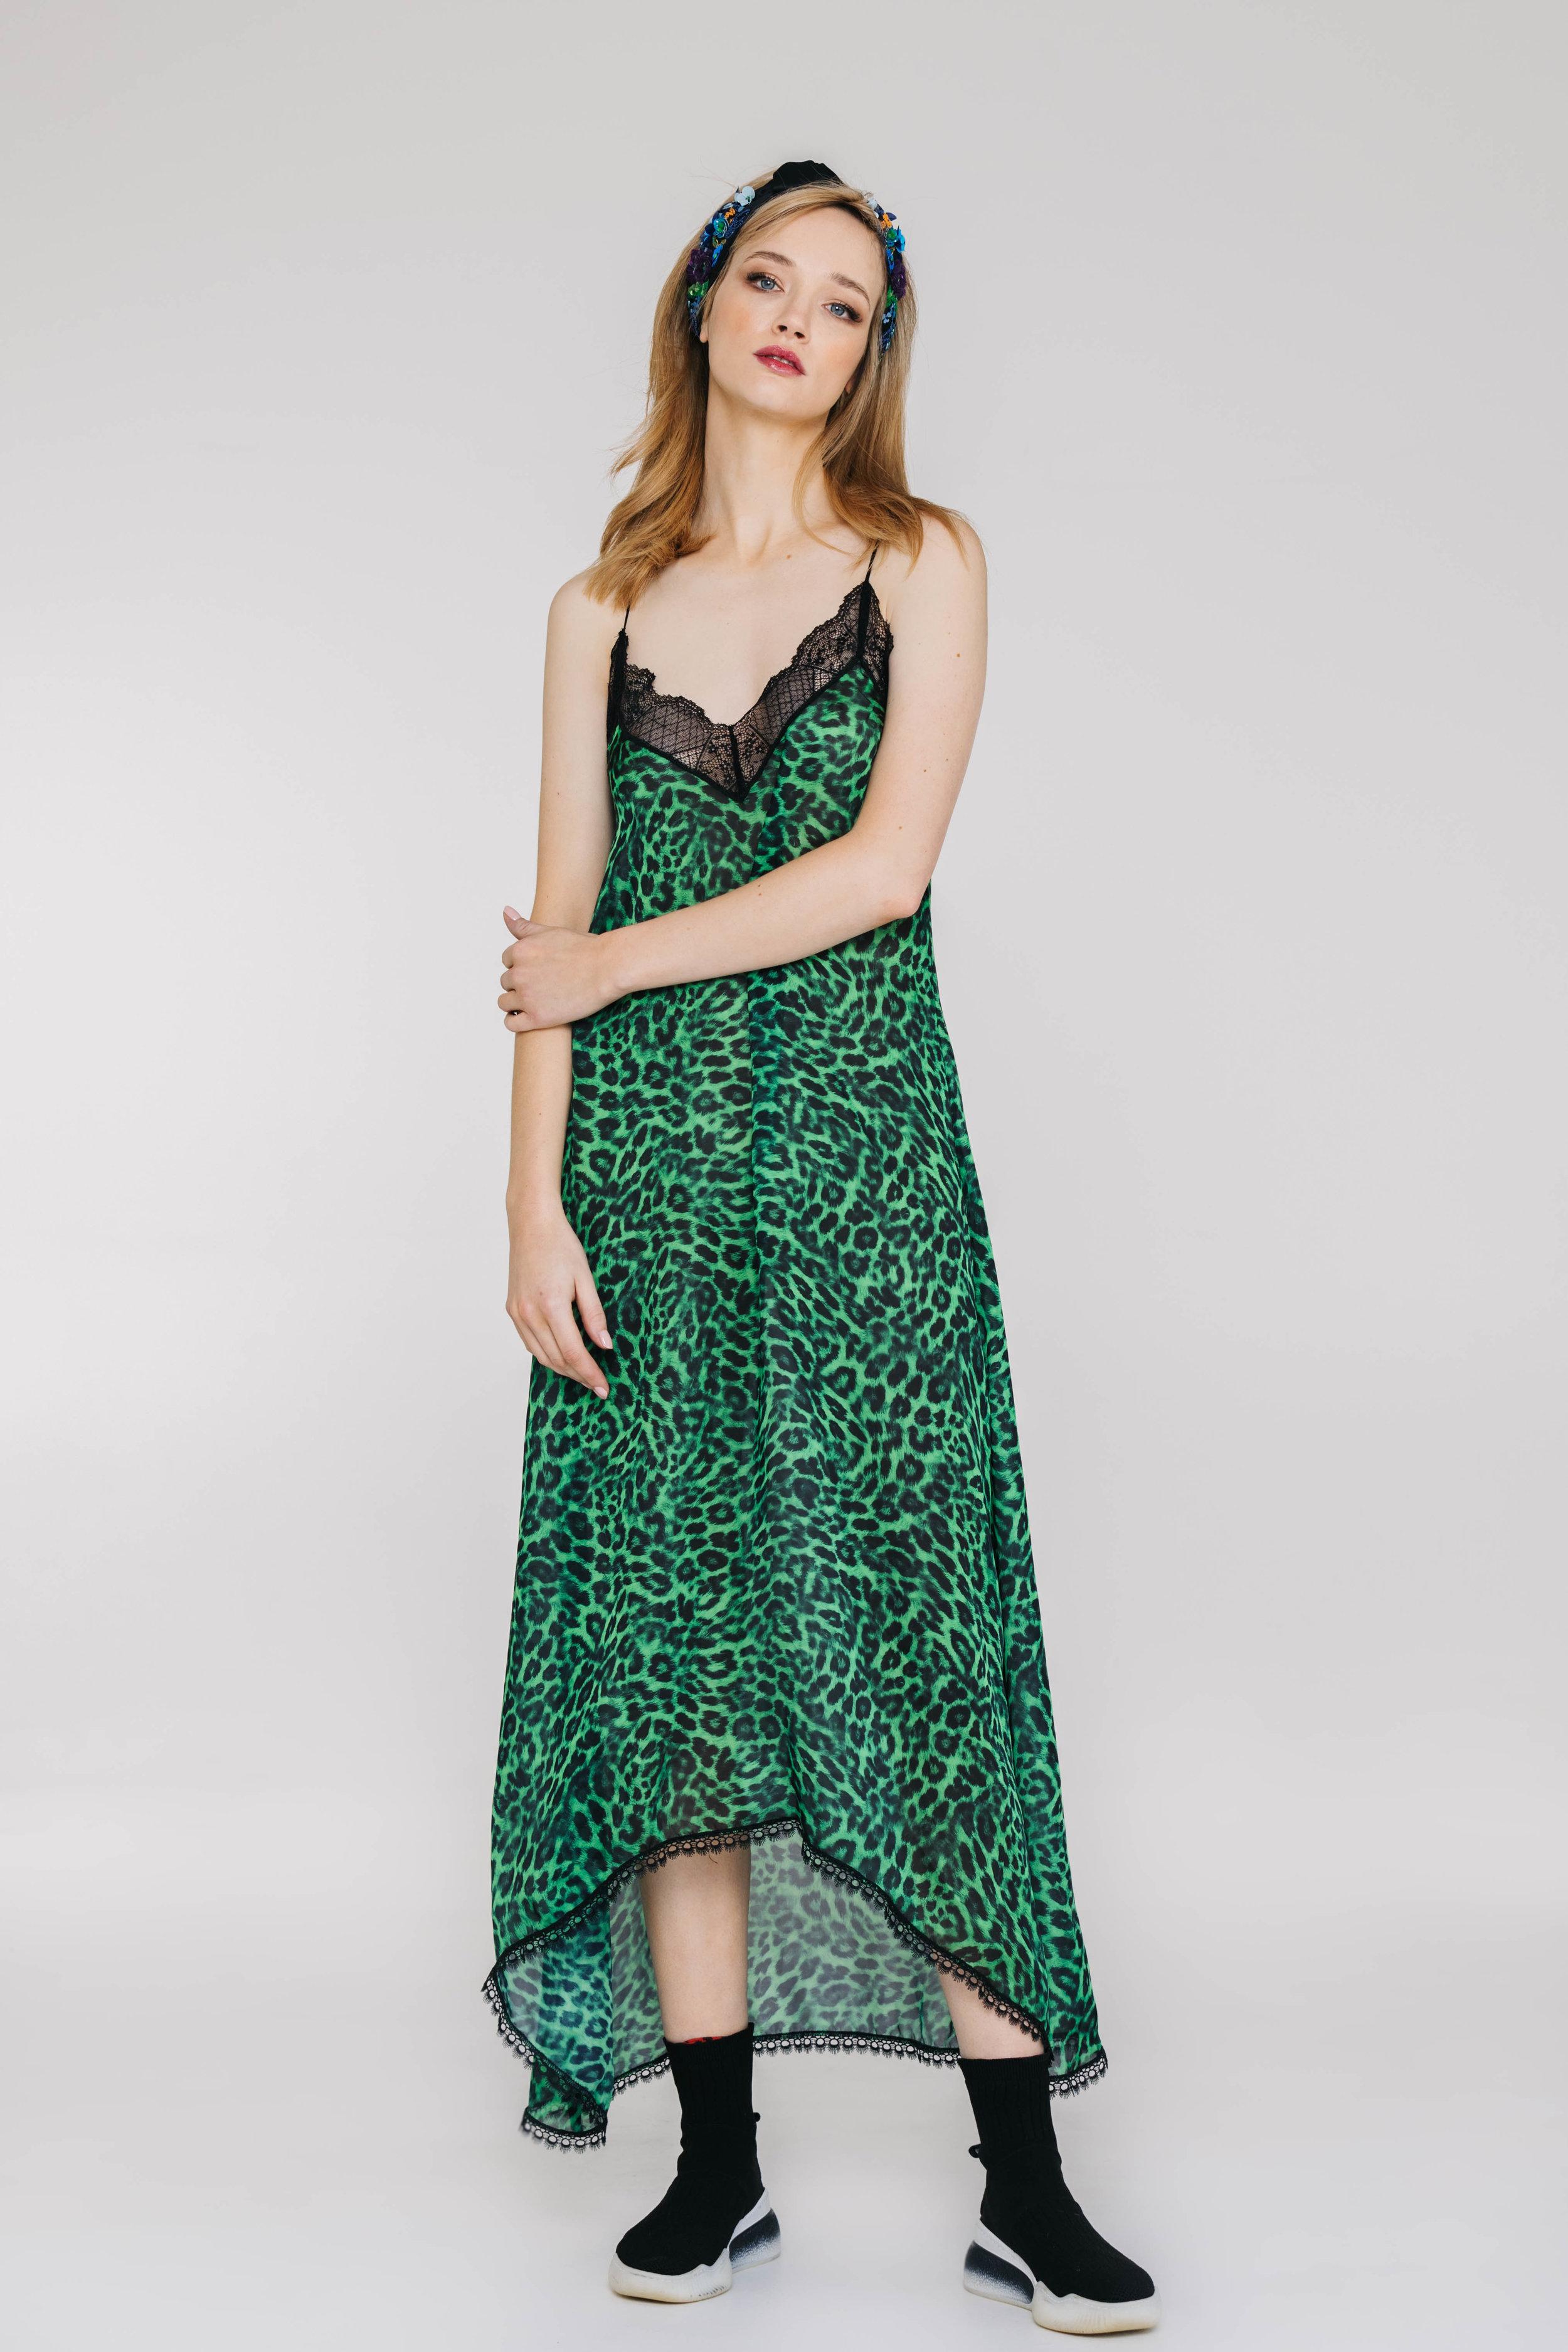 Honeymoon Dress 6469N Green Leopard